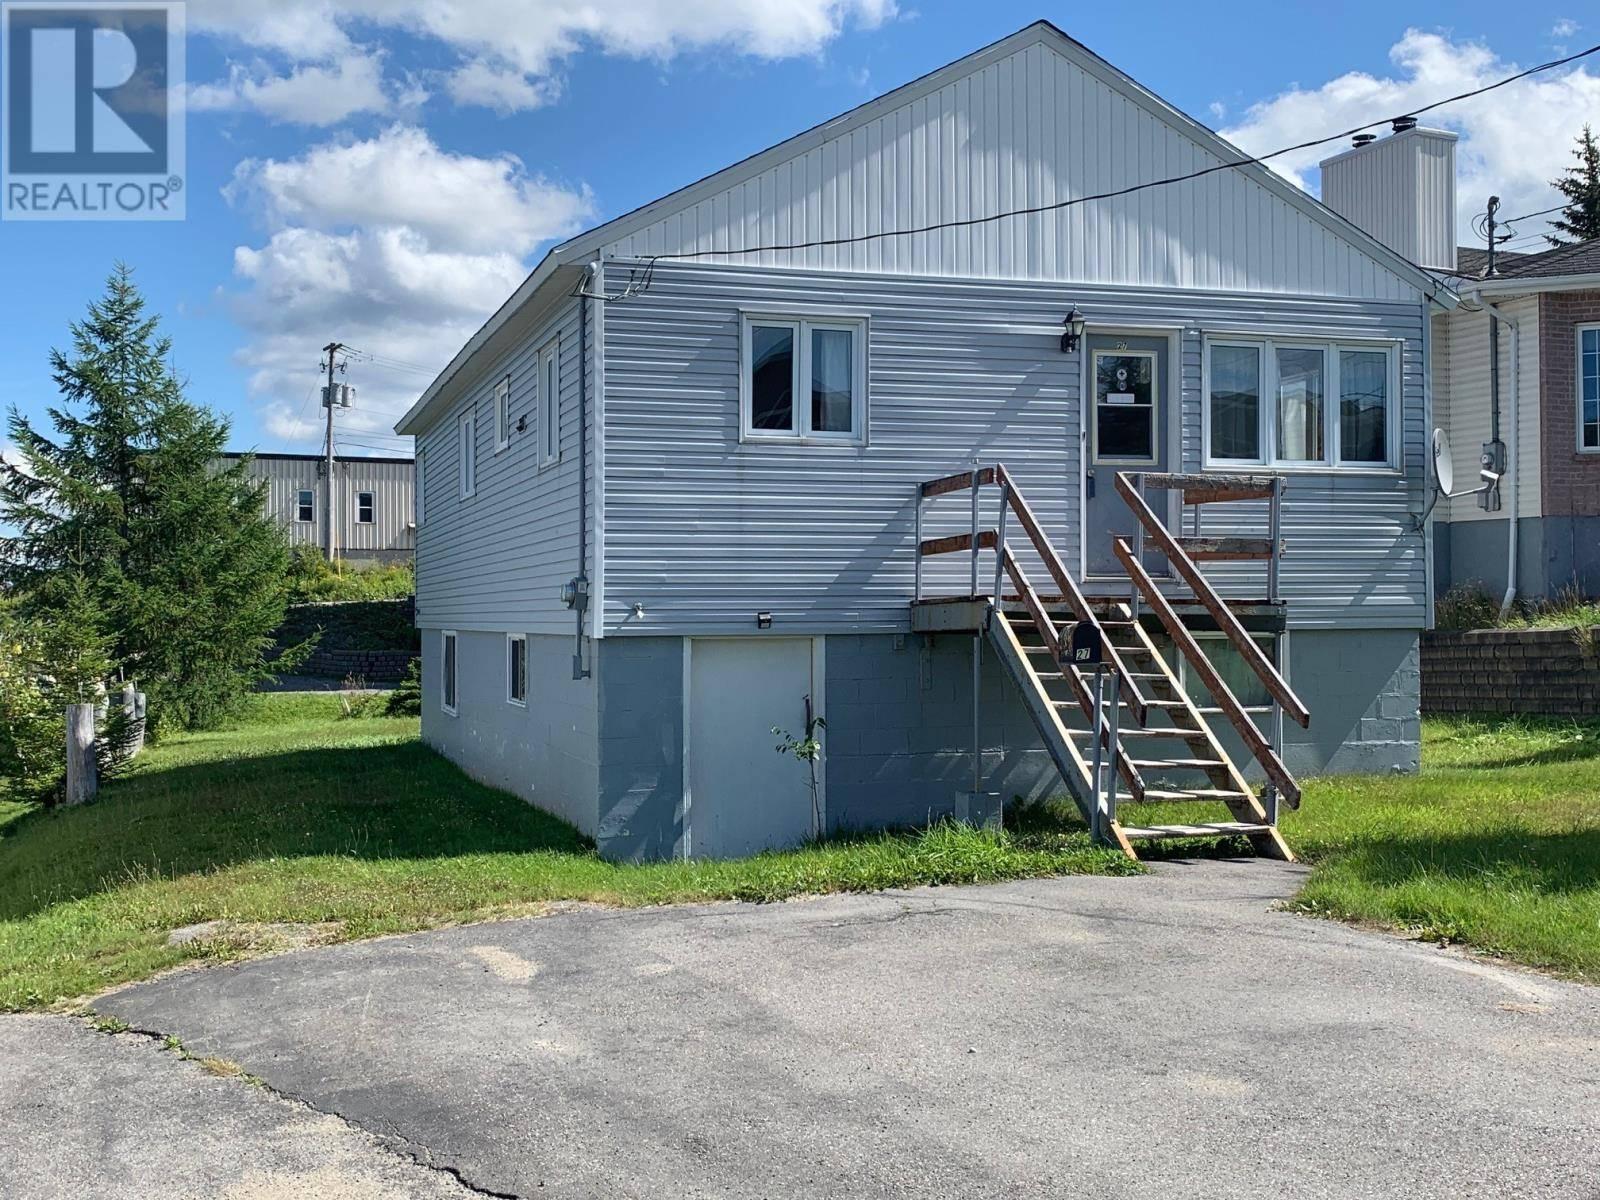 House for sale at 27 Boones Rd Corner Brook Newfoundland - MLS: 1199017